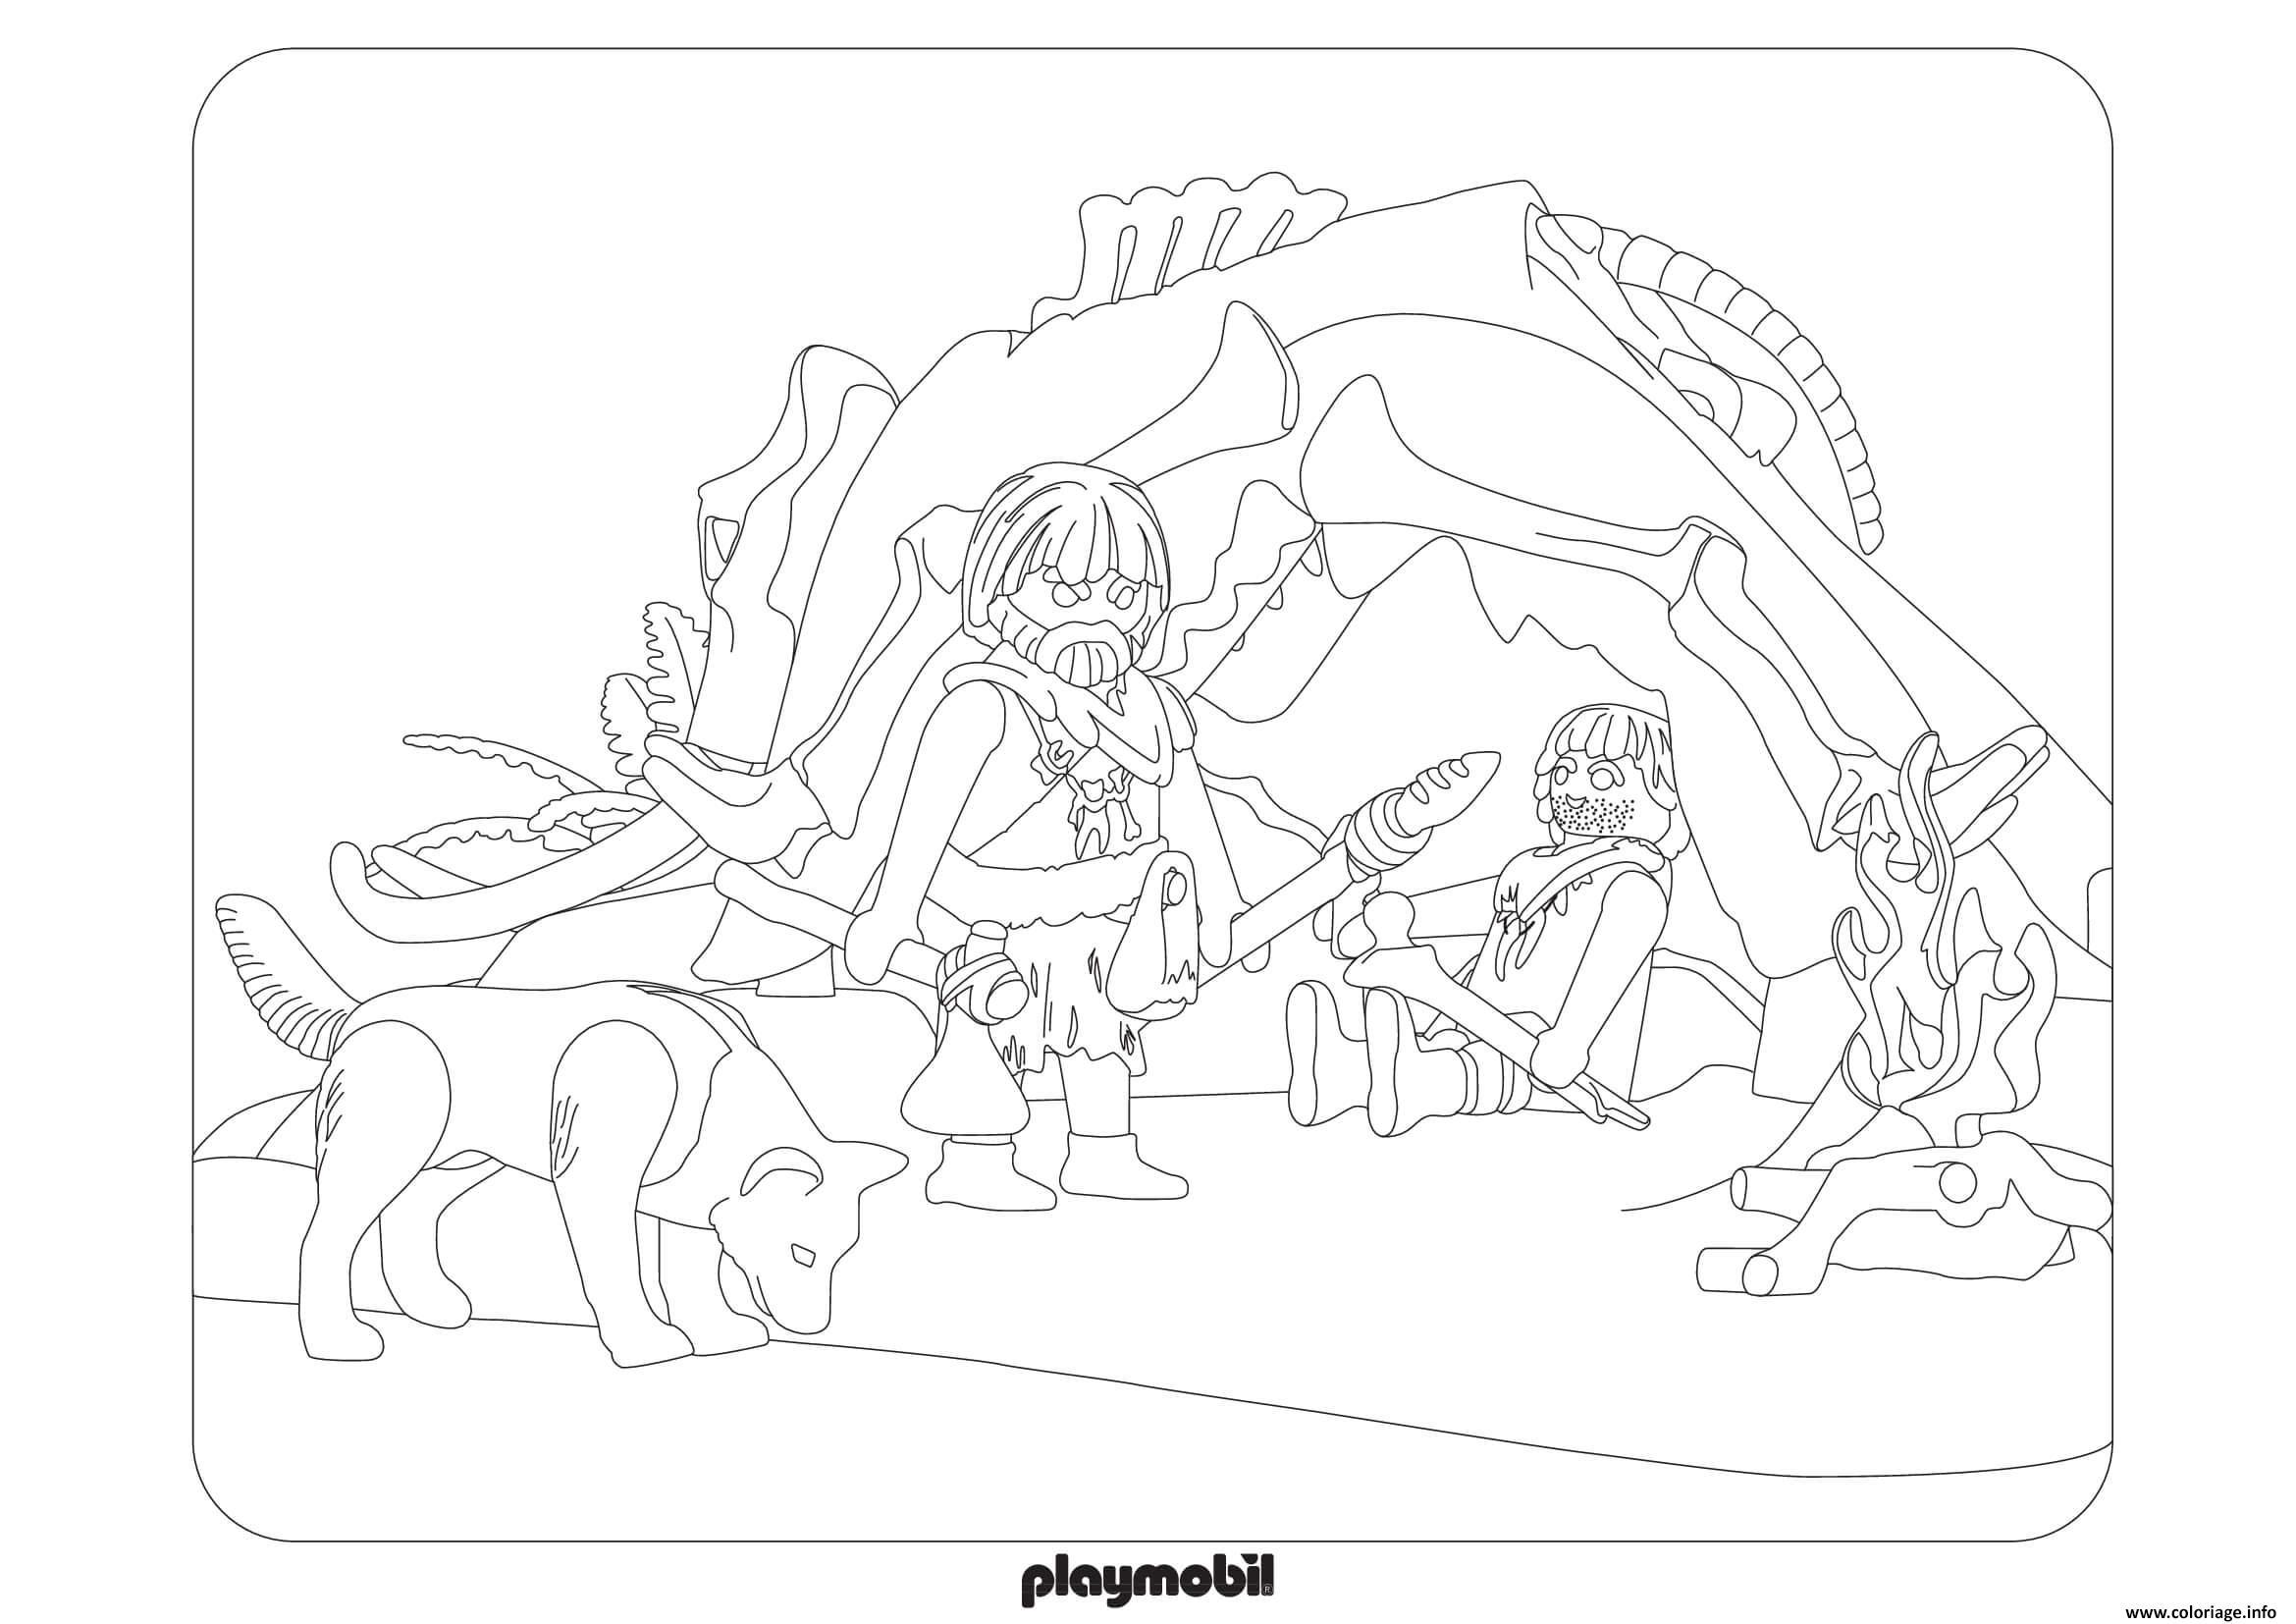 Coloriage Playmobil La Prehistoire Dessin Playmobil A Imprimer